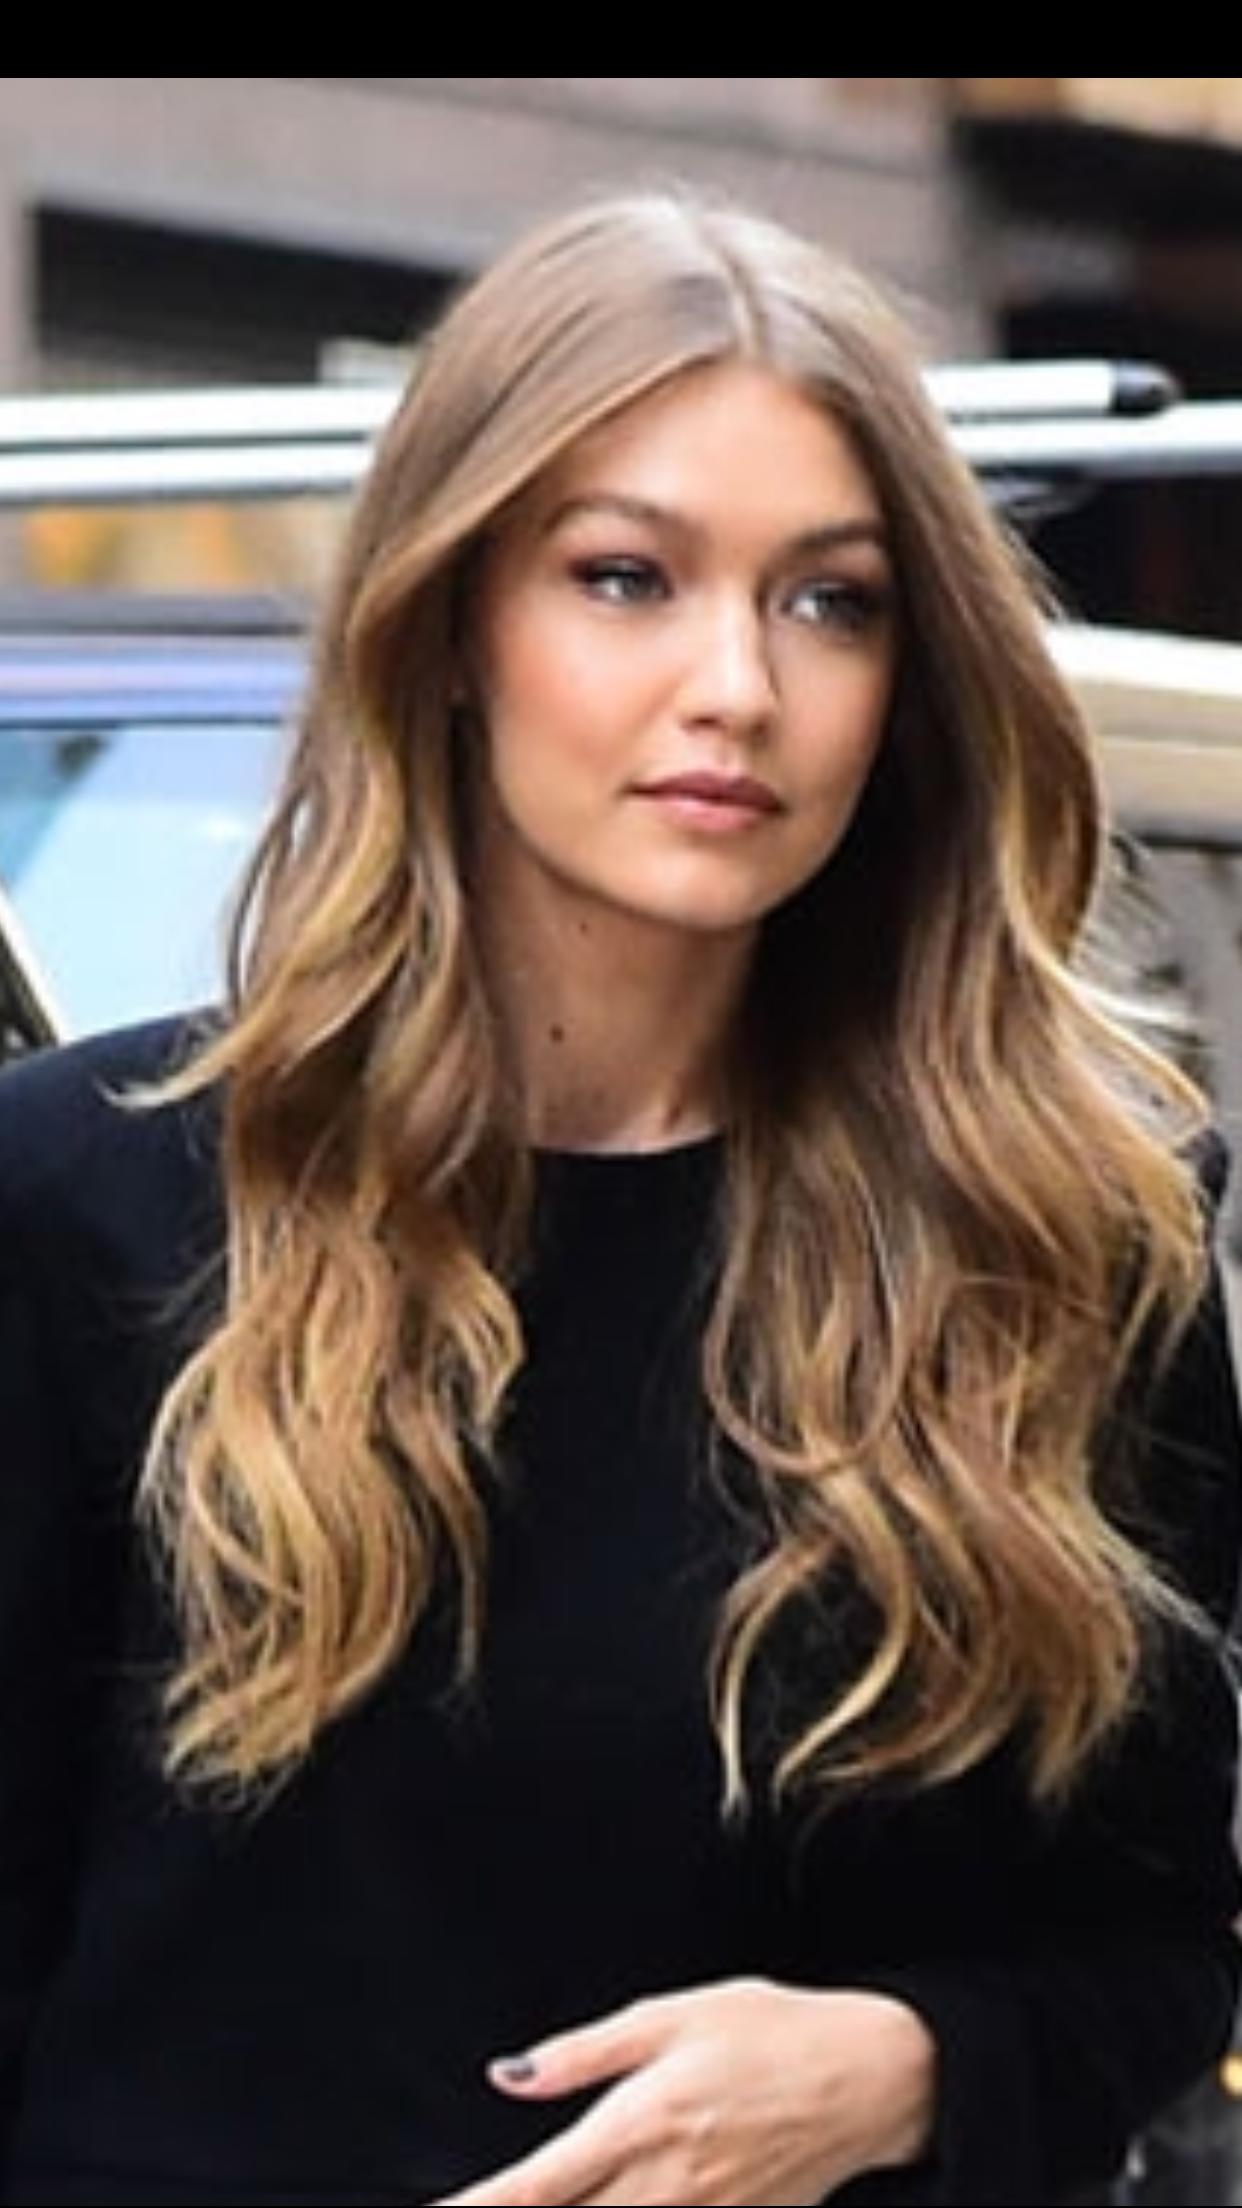 Baliage Hair Blonde Balayage Baliage Hair In 2020 Gigi Hadid Hair Color Baliage Hair Blonde Hair Color